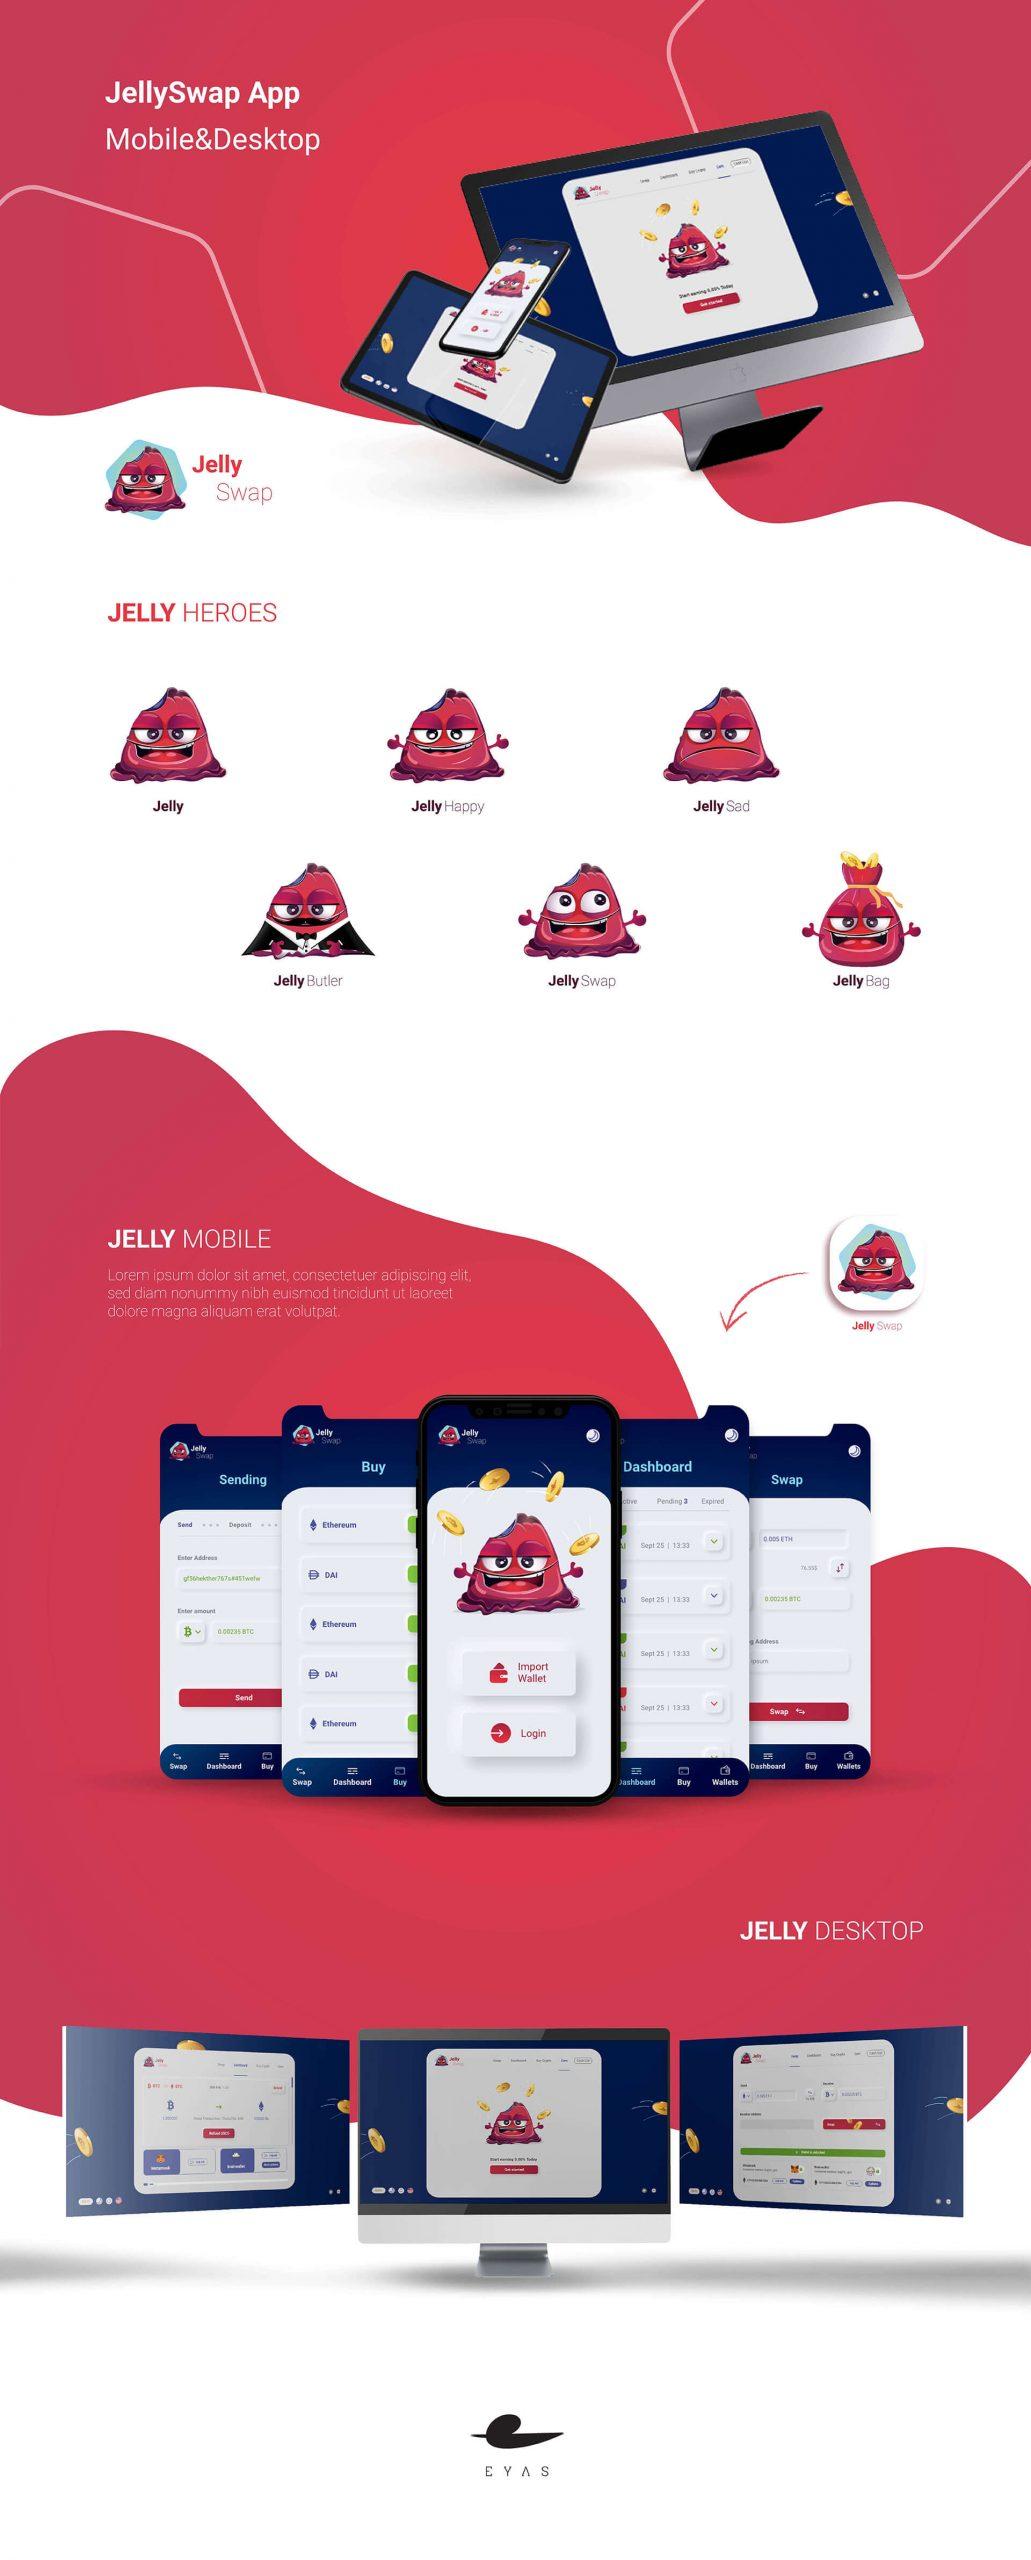 Jelly Swap App